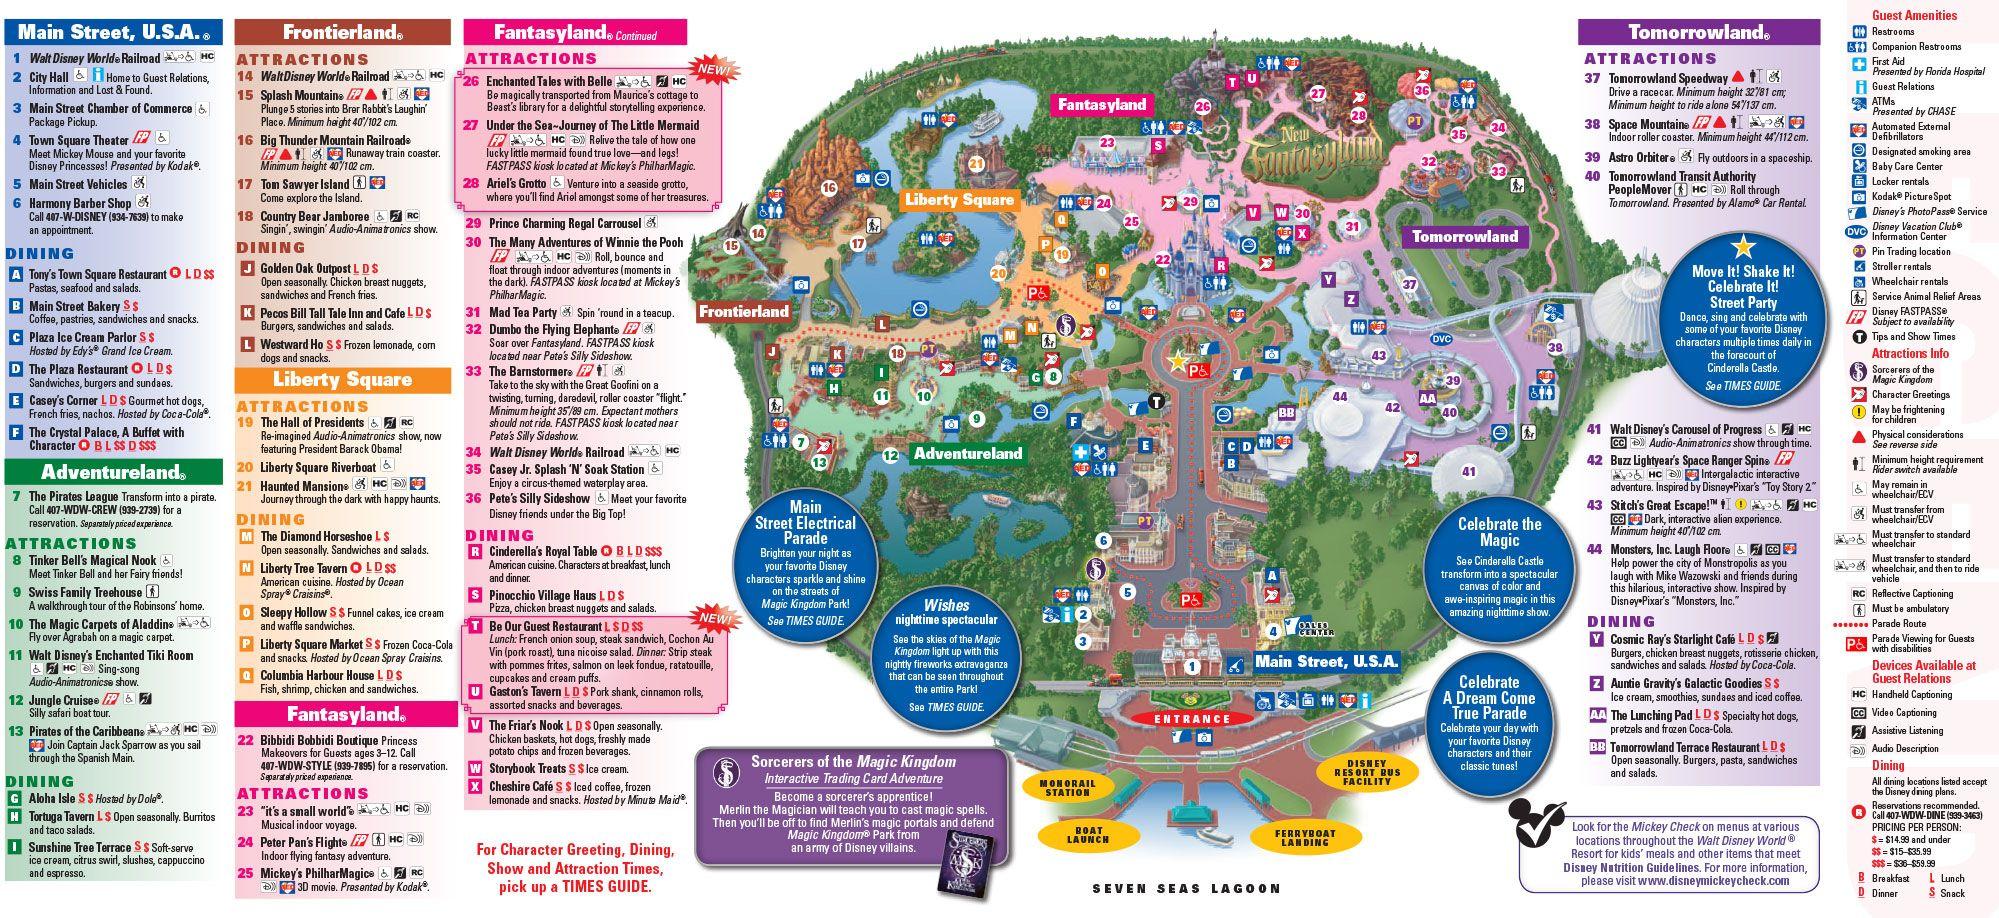 full map of magic kingdom park in walt disney world florida enjoy